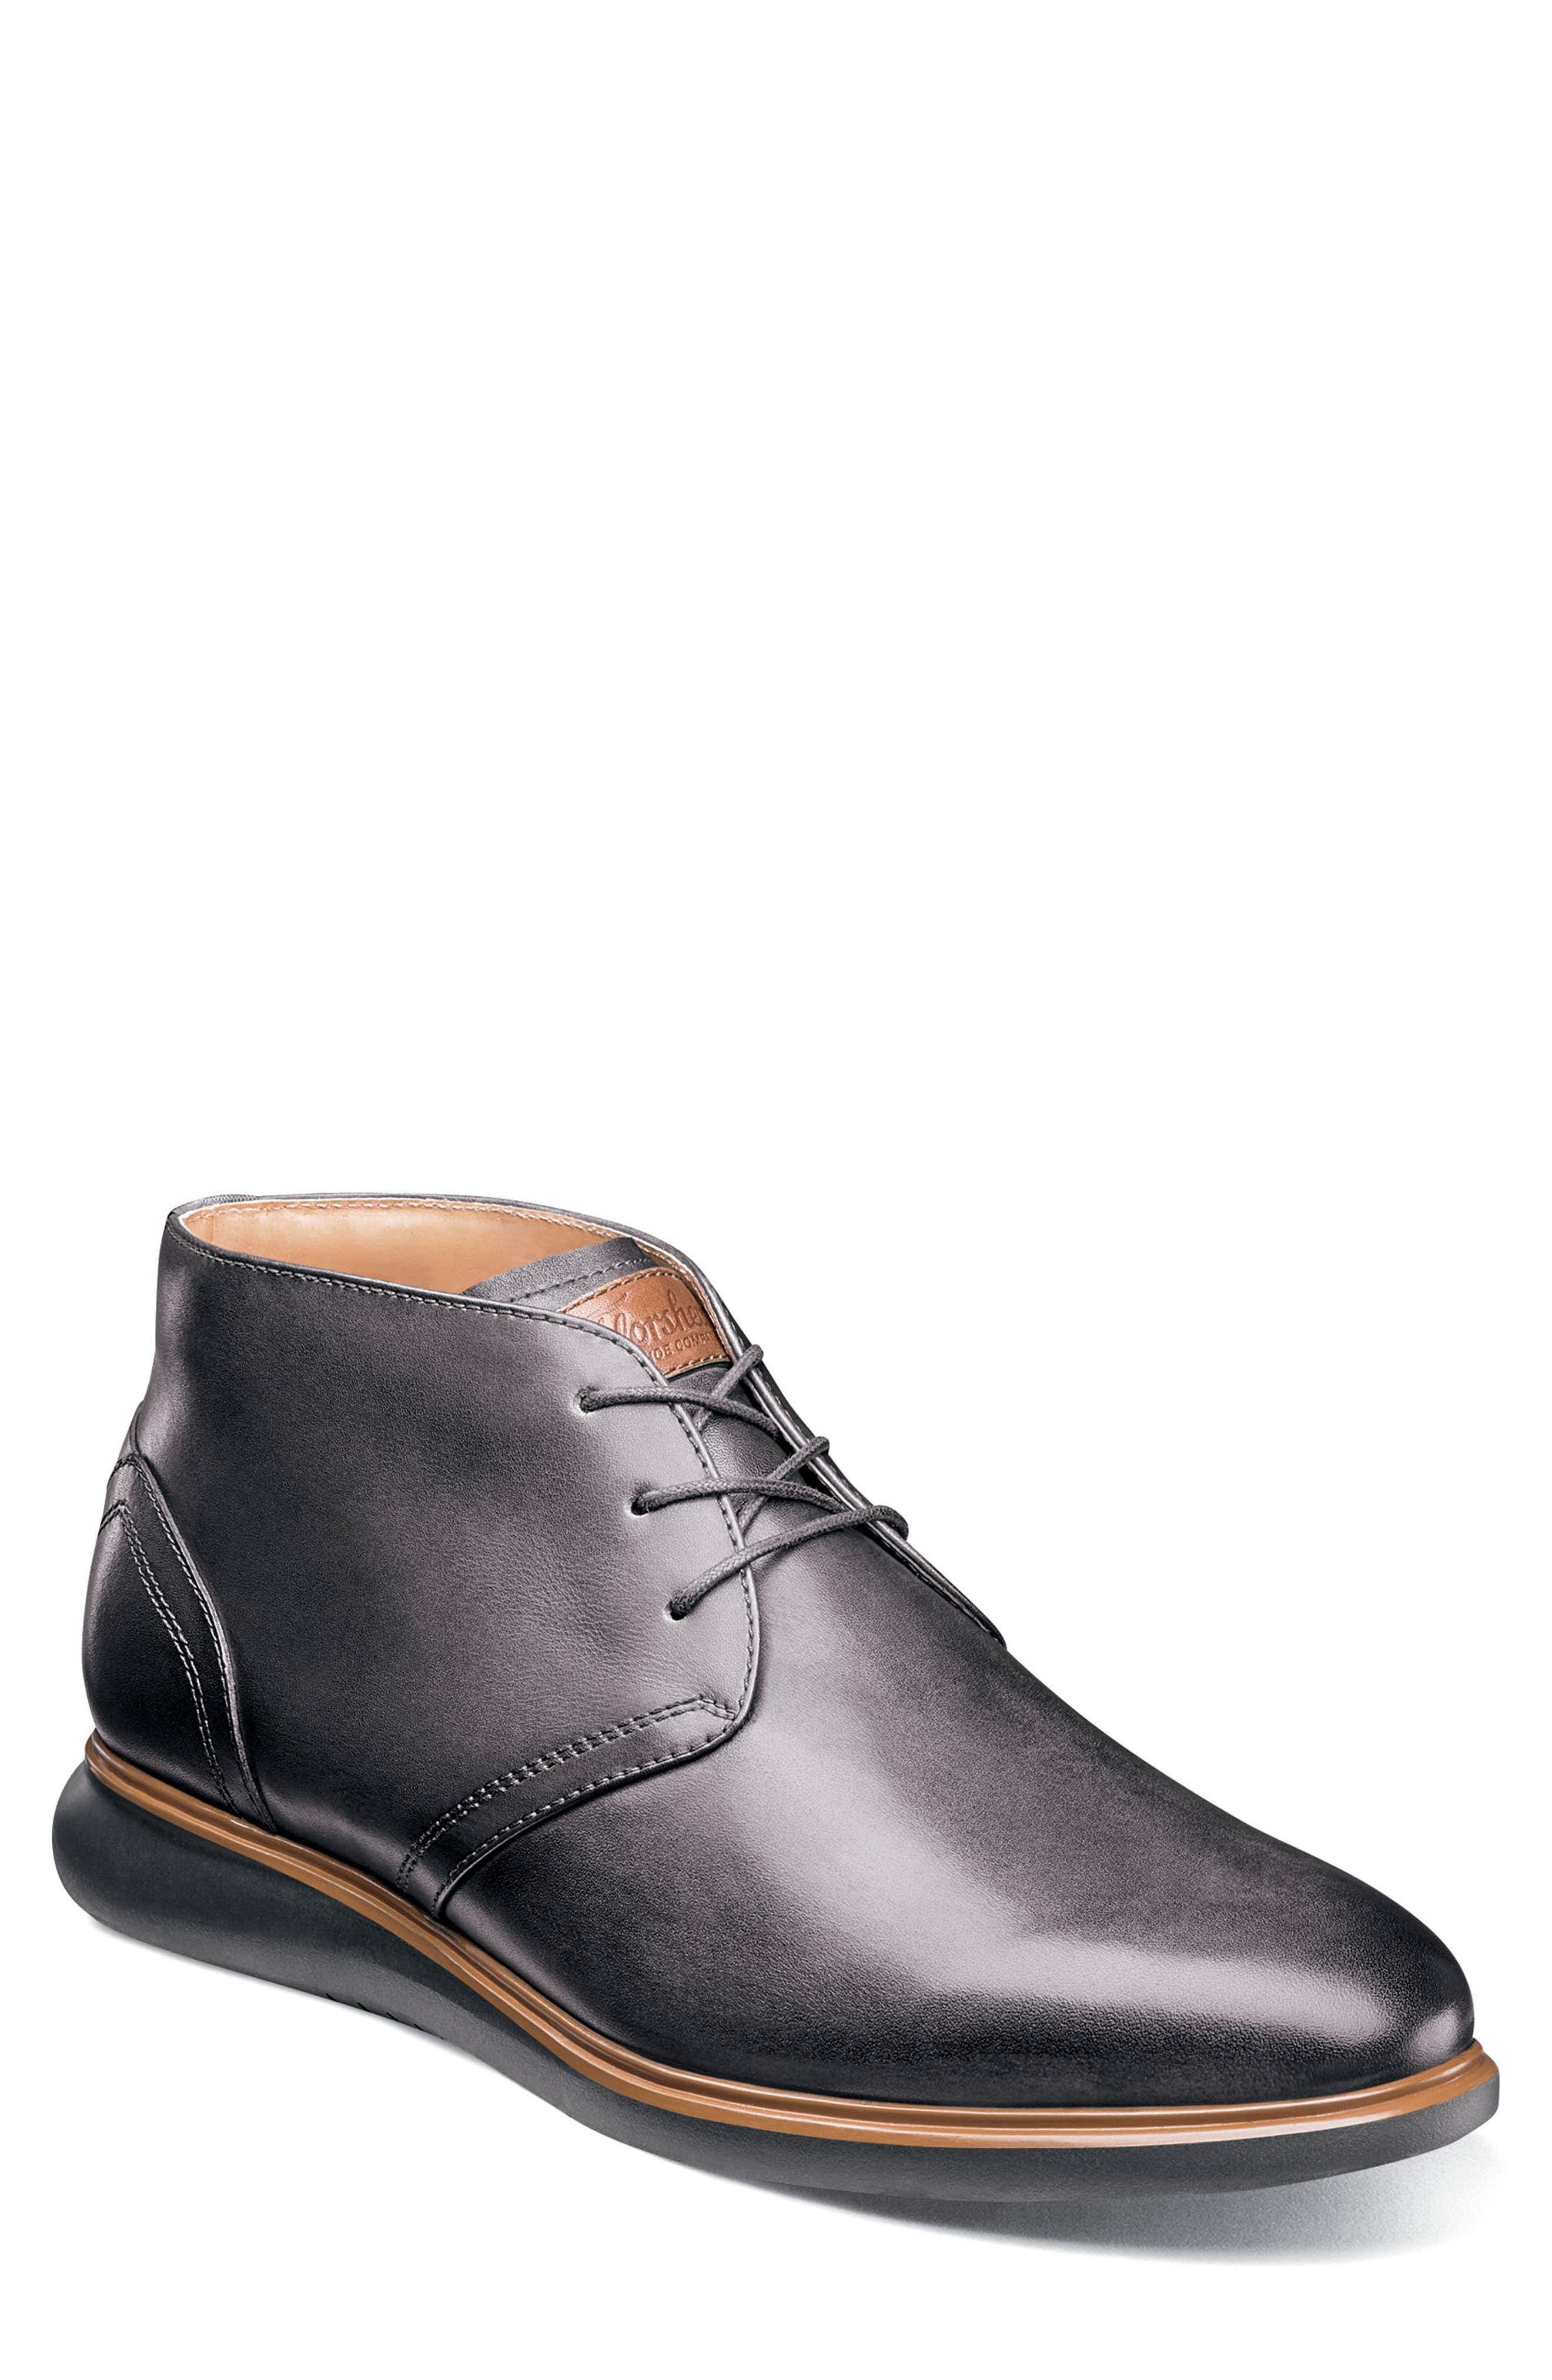 Florsheim Fuel Chukka Boot, Grey